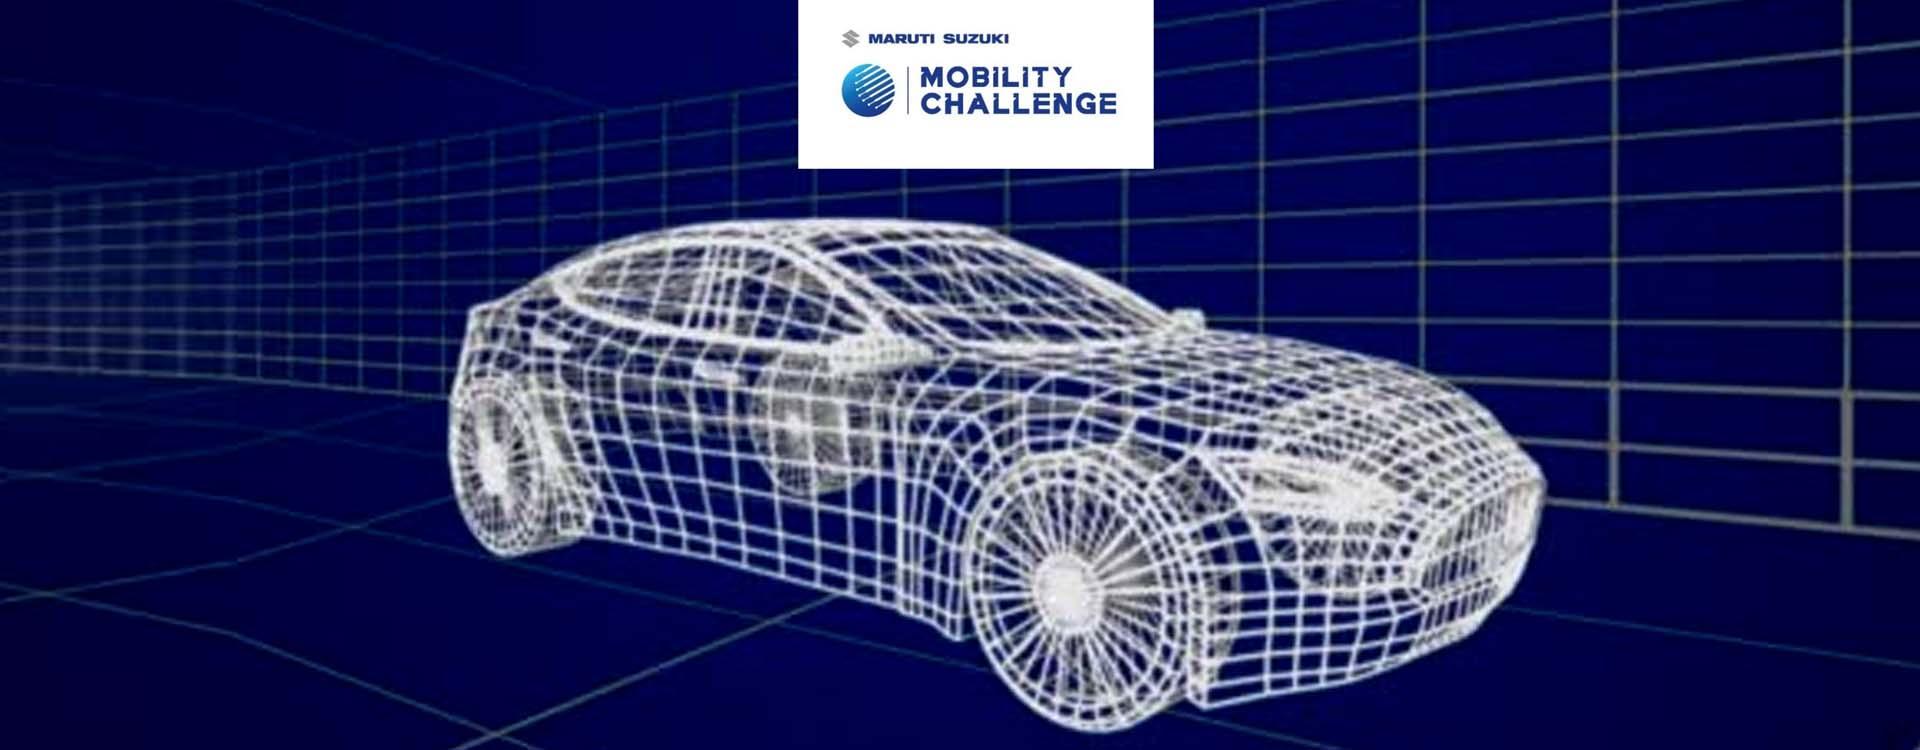 Maruti Suzuki Mobility Challenge For 2021